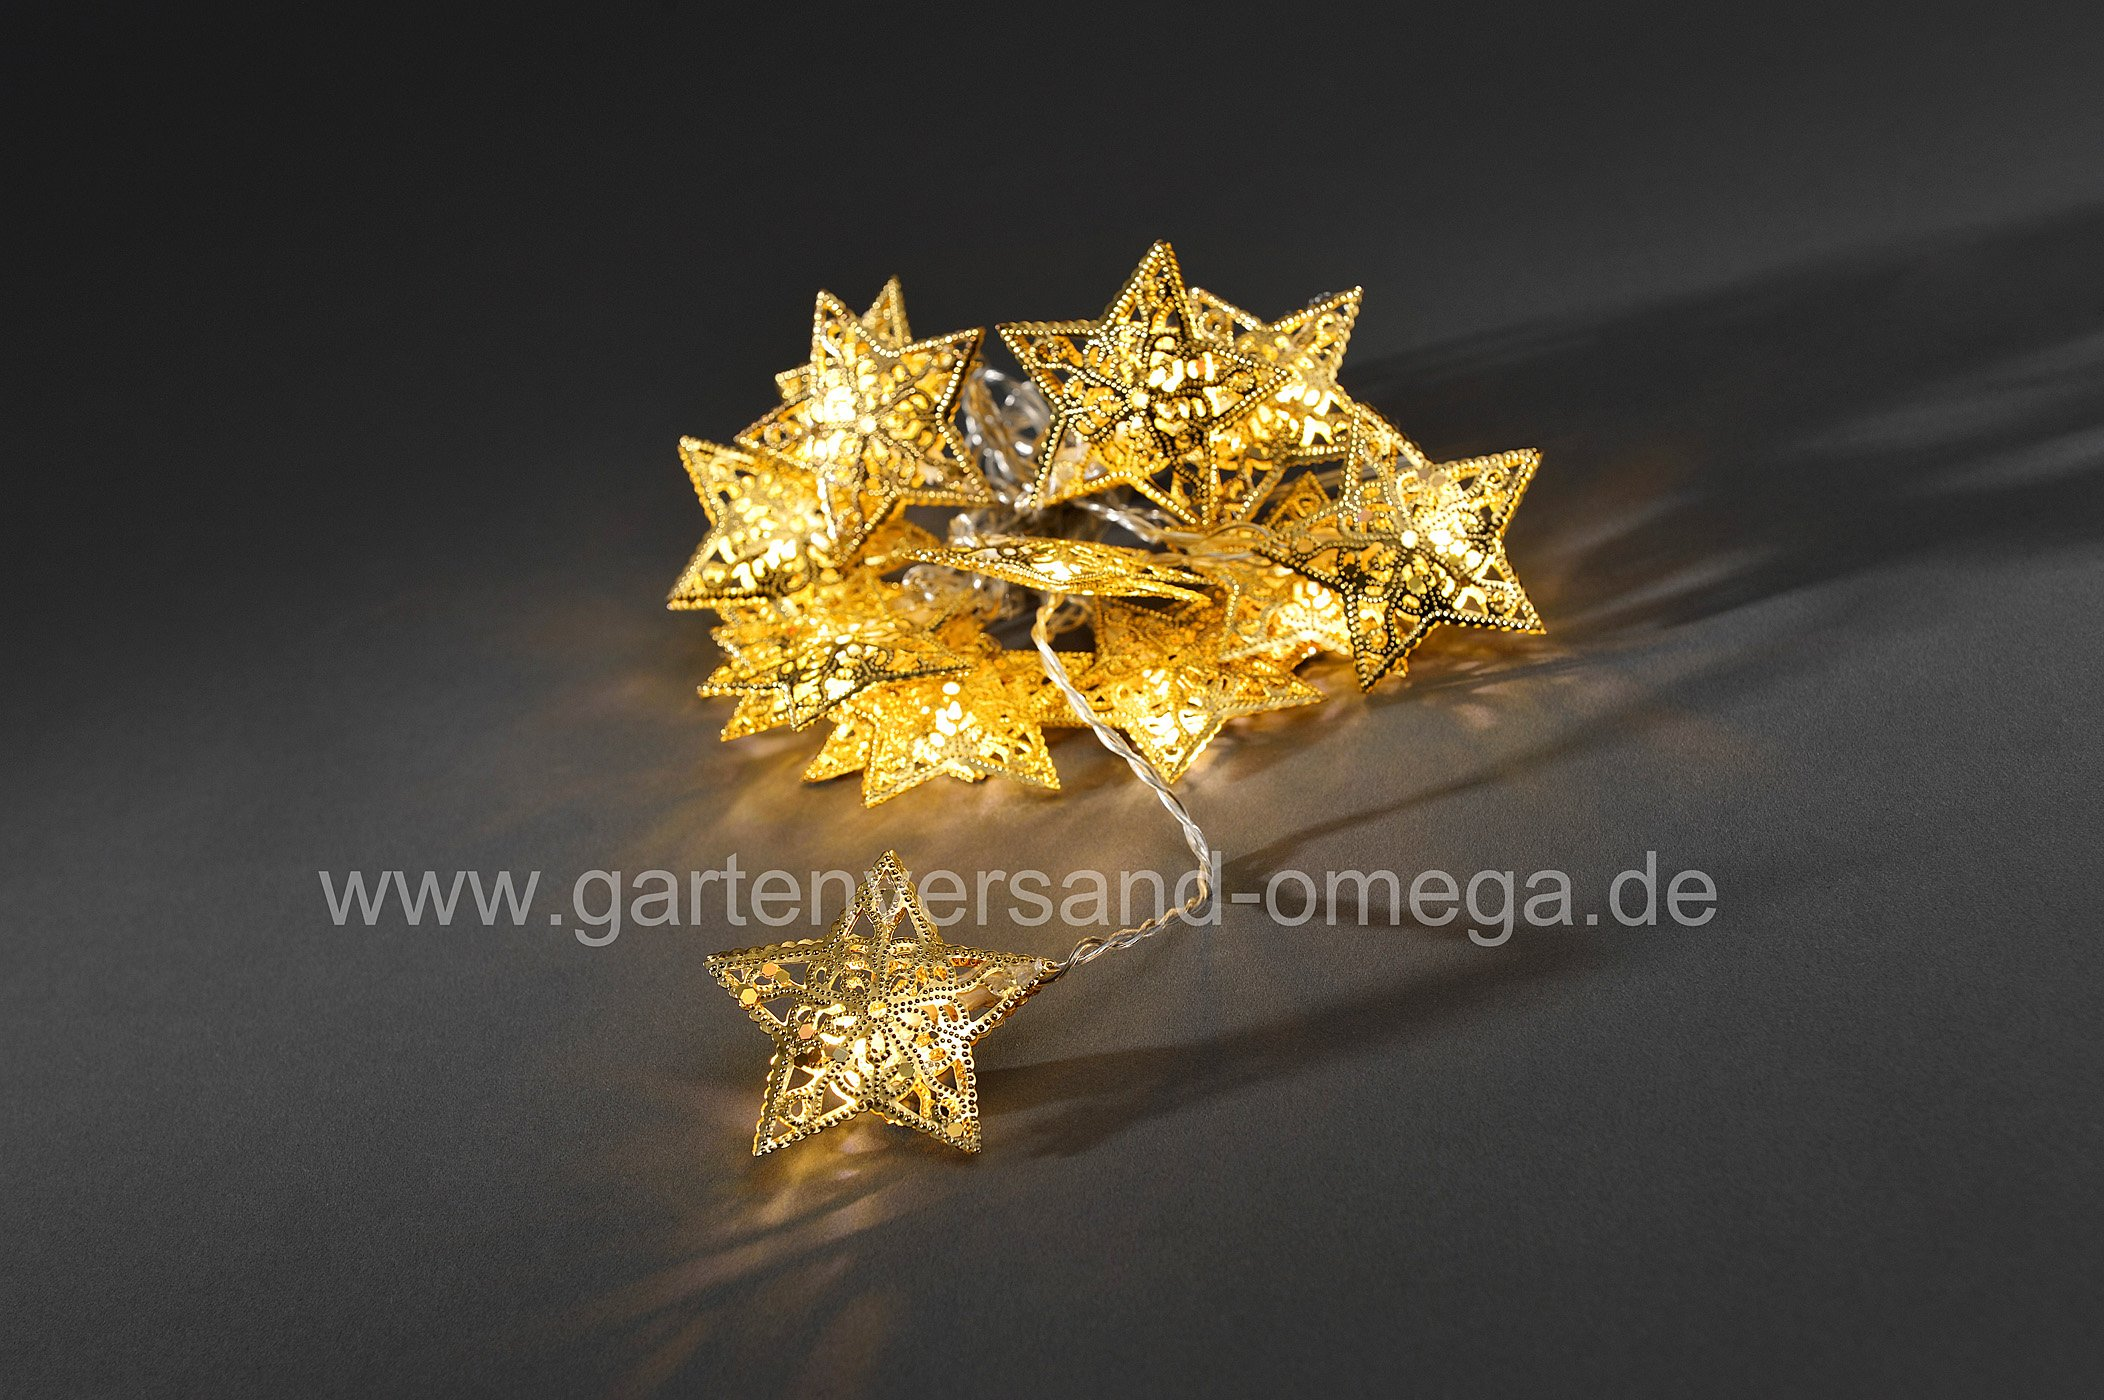 led lichterkette mit goldenen metallsternen dekoration in innenr umen sparsame lichterkette. Black Bedroom Furniture Sets. Home Design Ideas